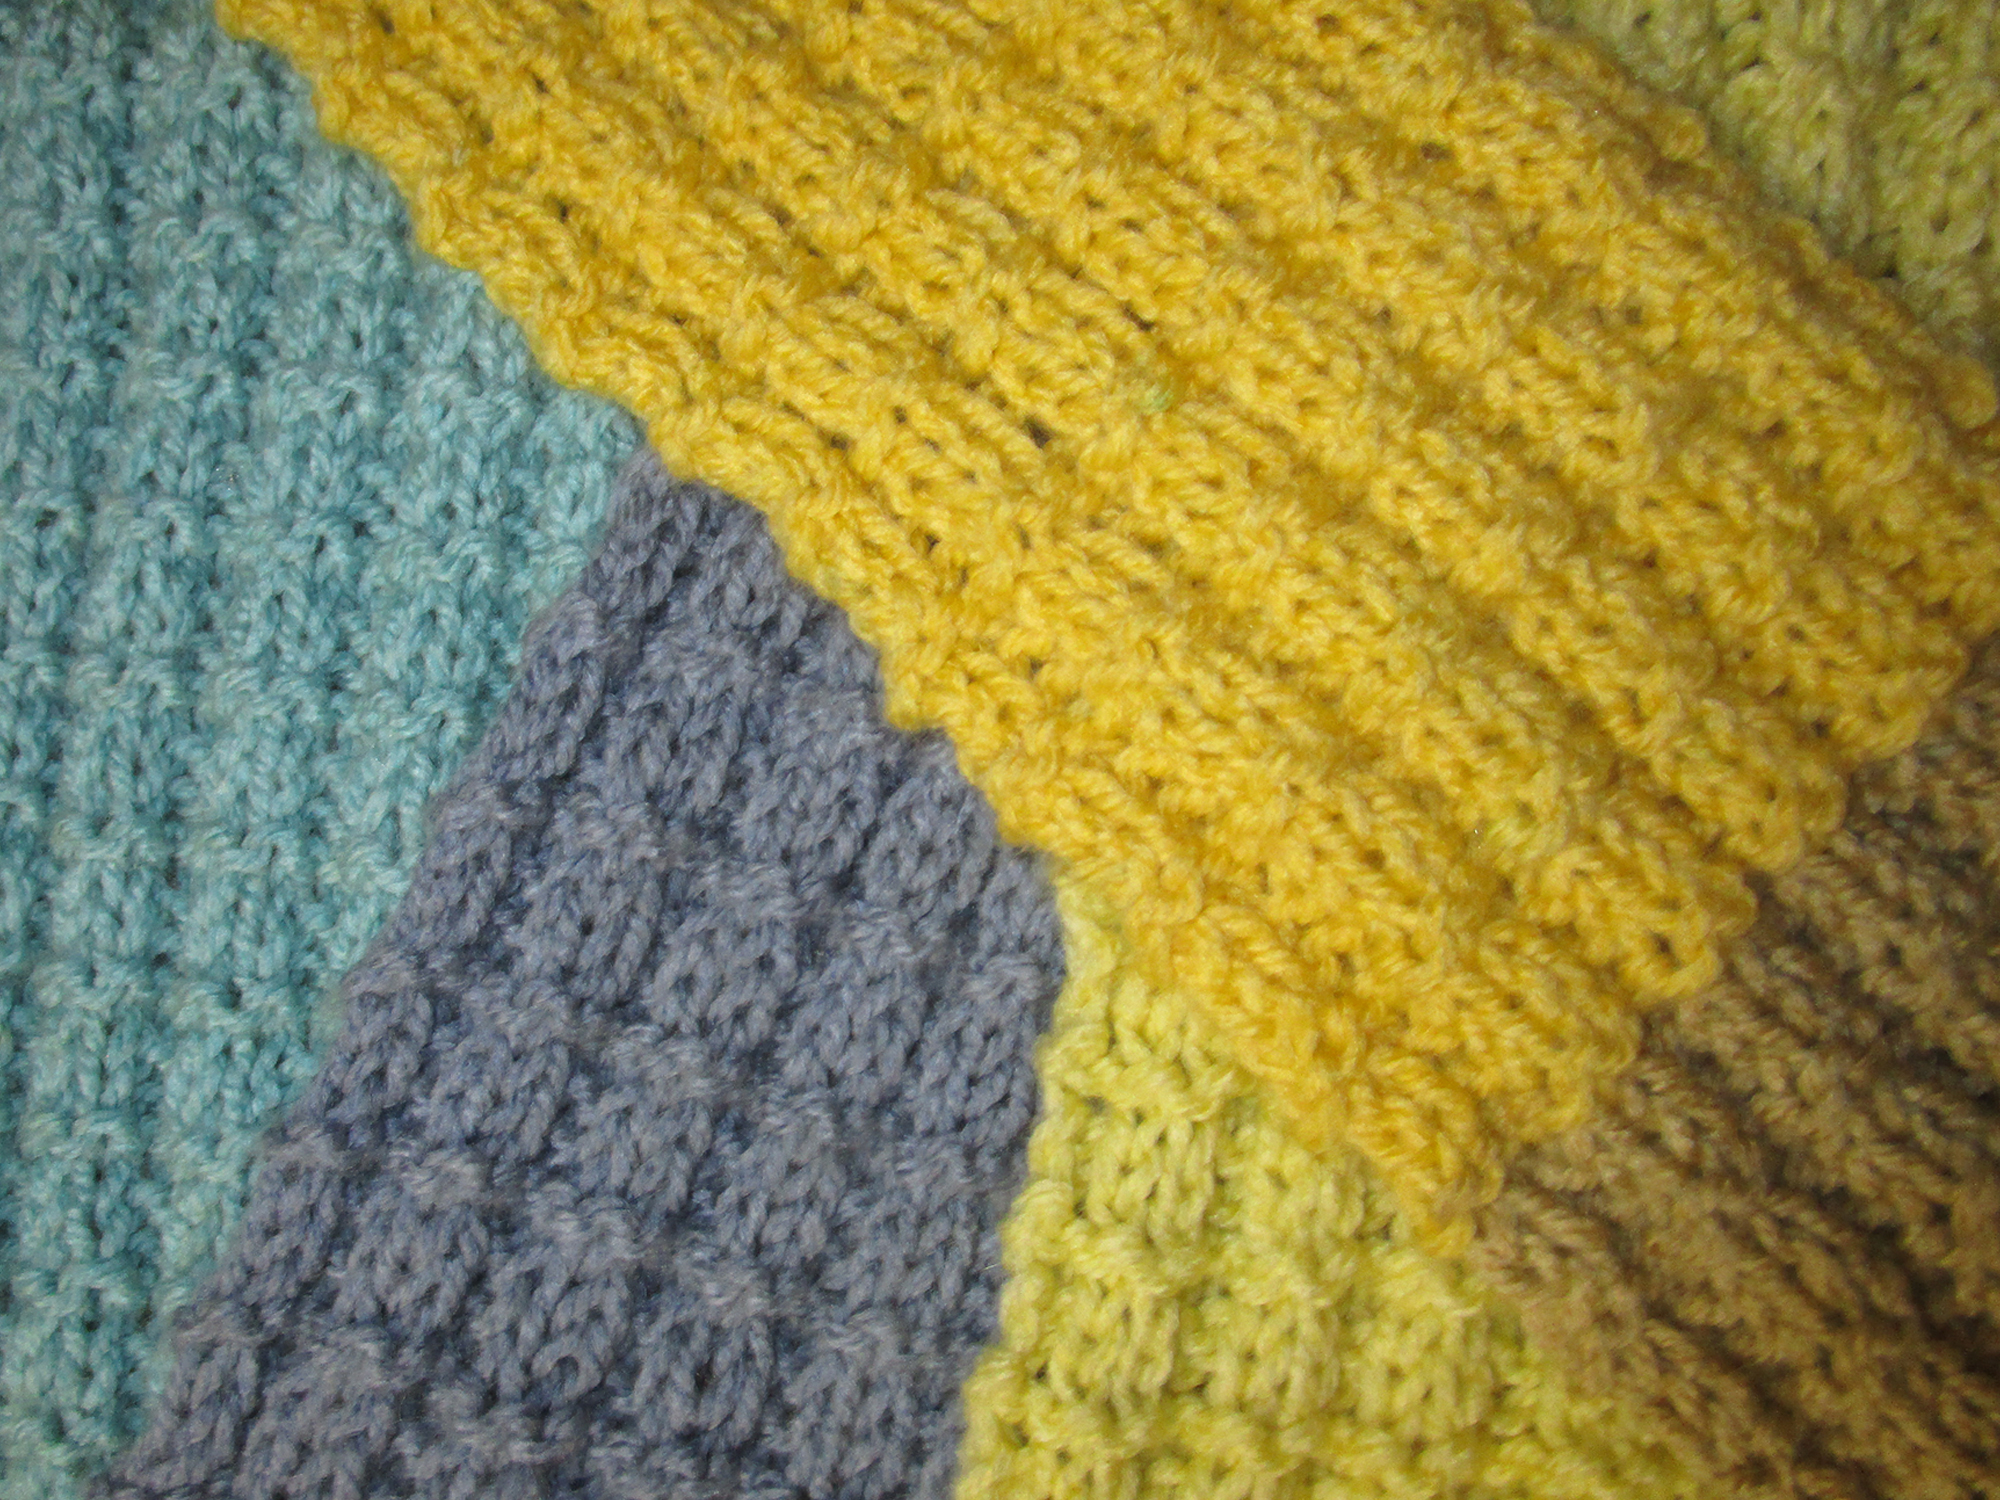 yarn crafters image 3.jpg